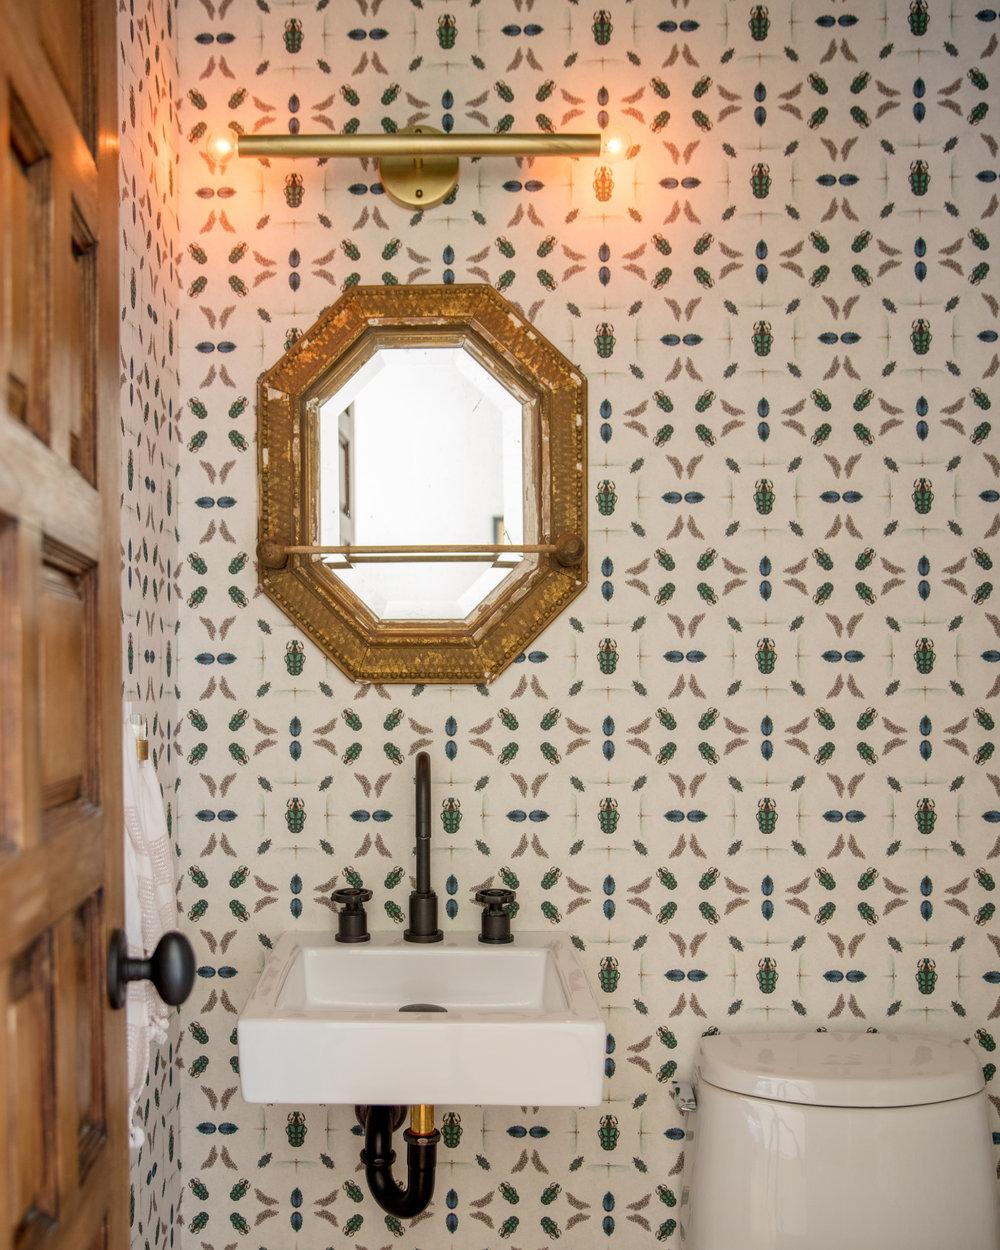 FletcherRhodes powderroom bug wallpaper.jpg